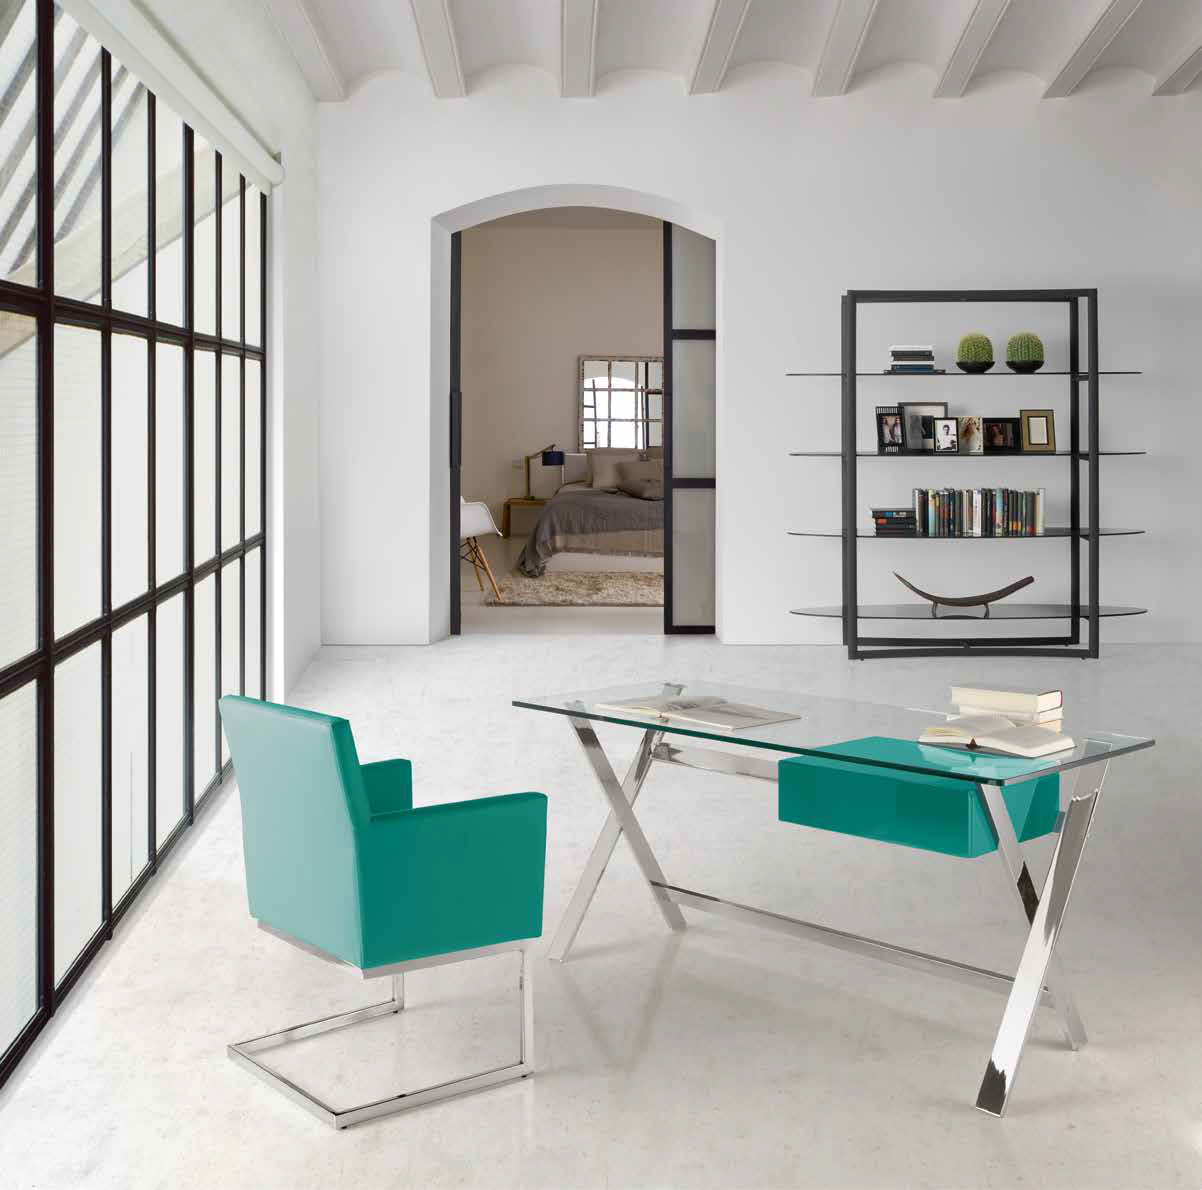 mesa despacho dise o zacatecas muebles d azmuebles d az